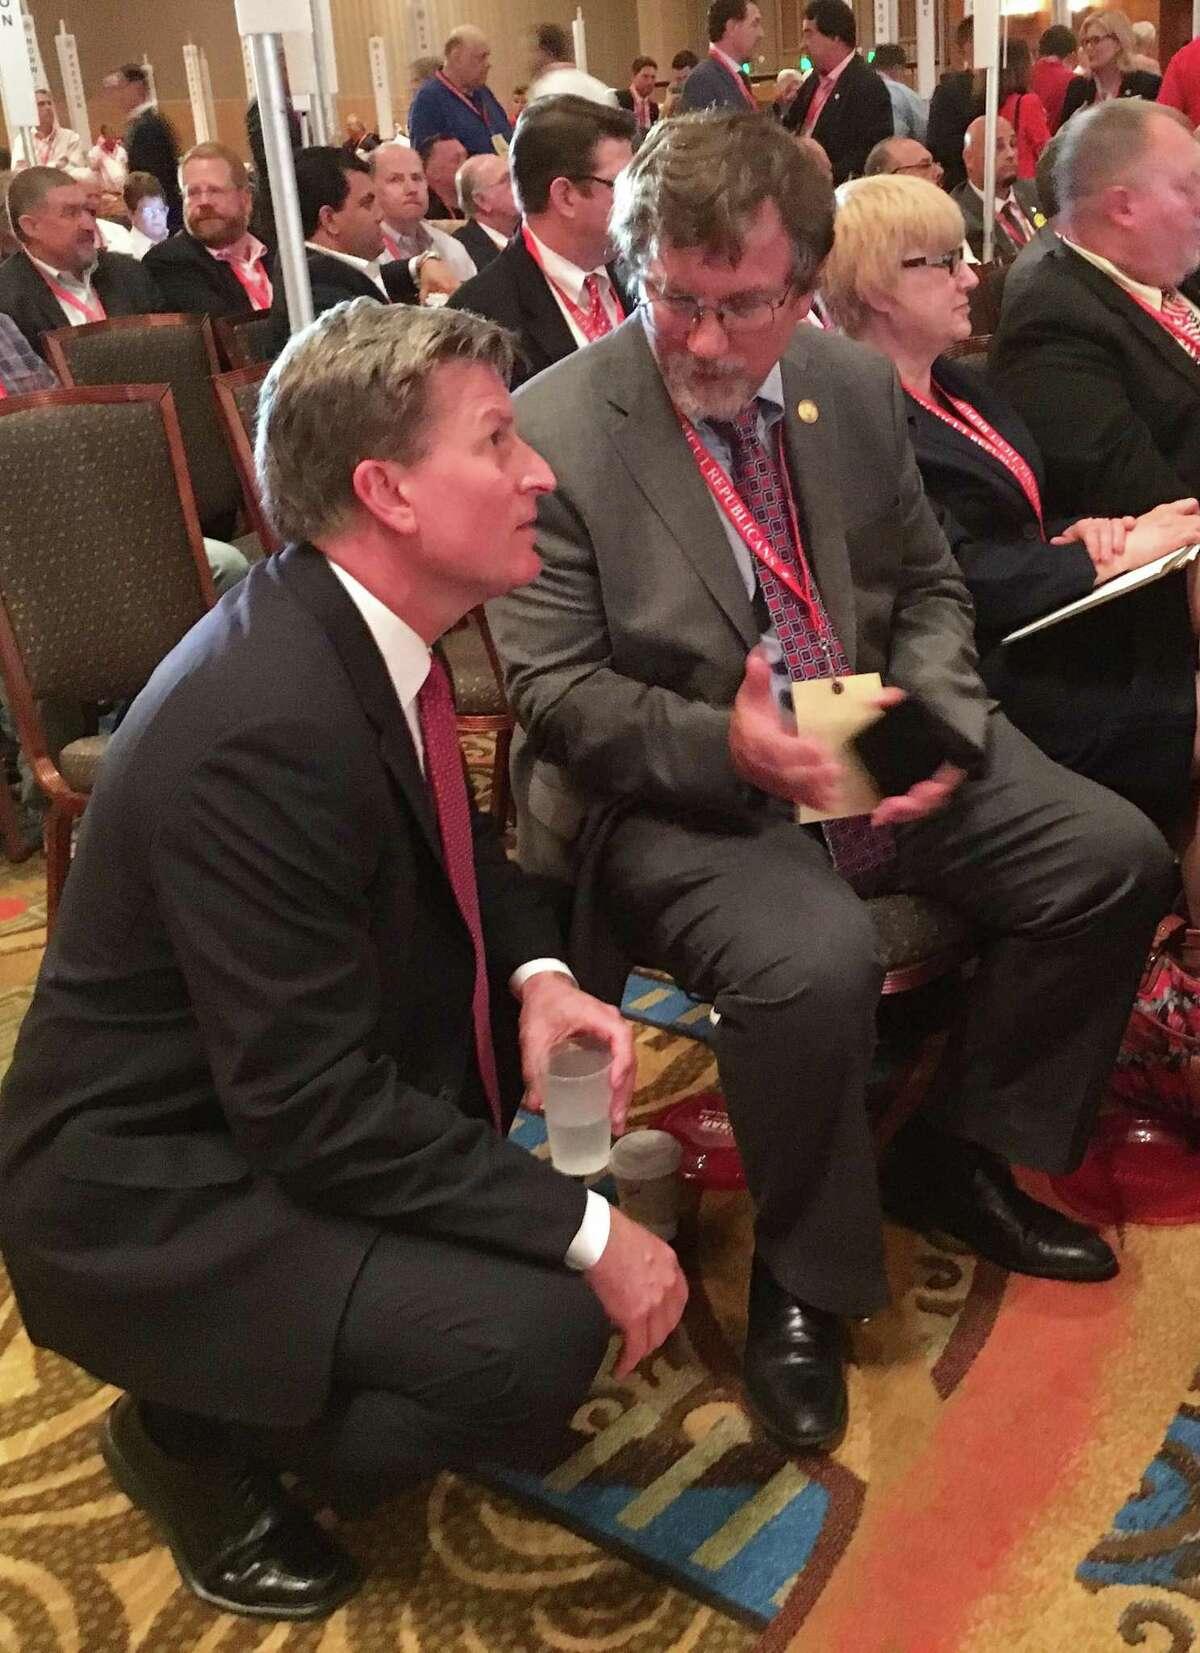 Republican gubernatorial candidate Steve Obsitnik at the state Republican convention Saturday speaks with Monroe delegate Jim Weinberg.